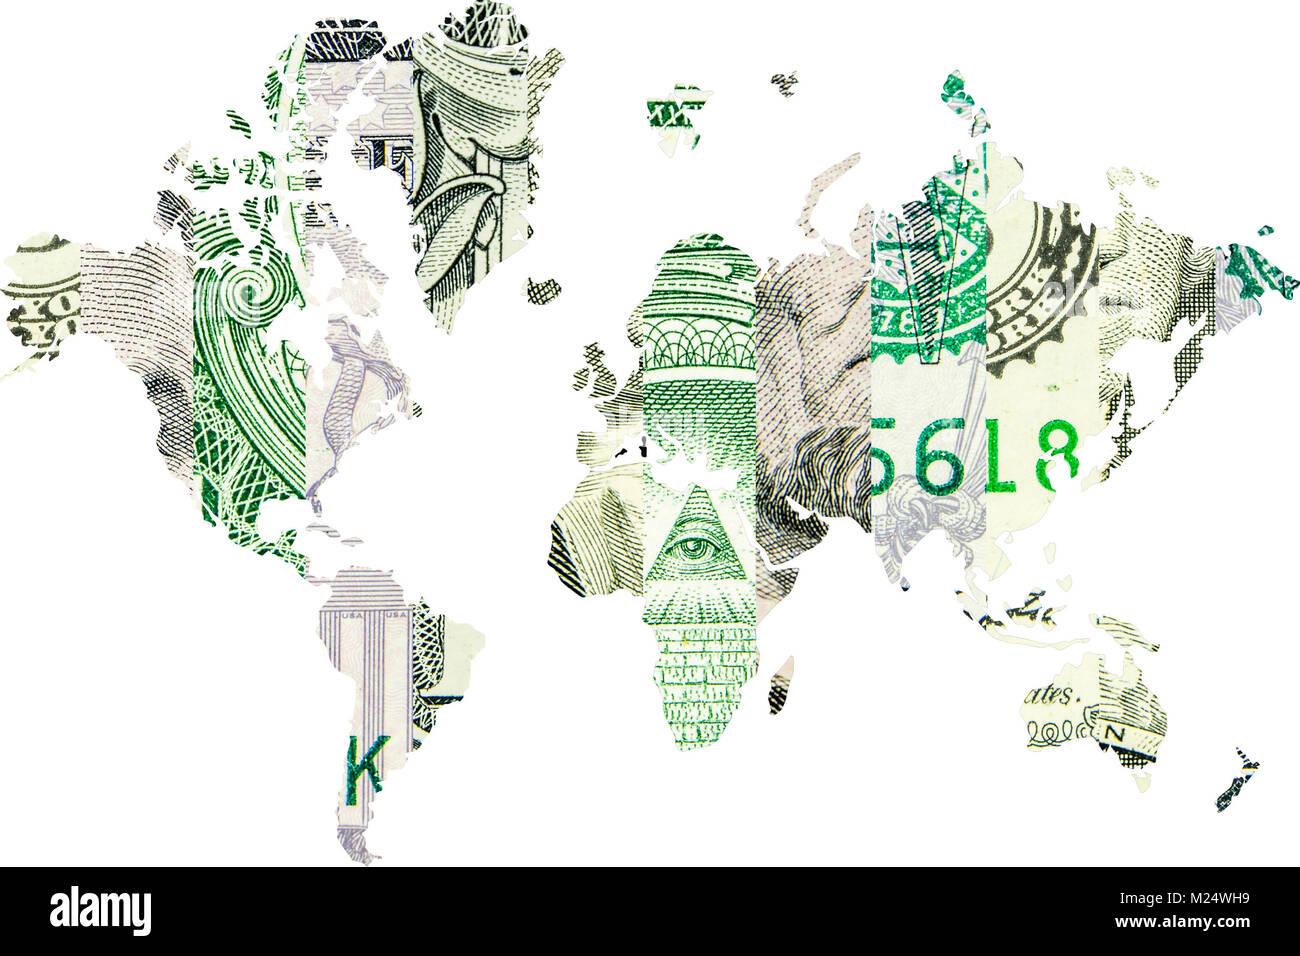 worldwide usage of american dollar - Stock Image